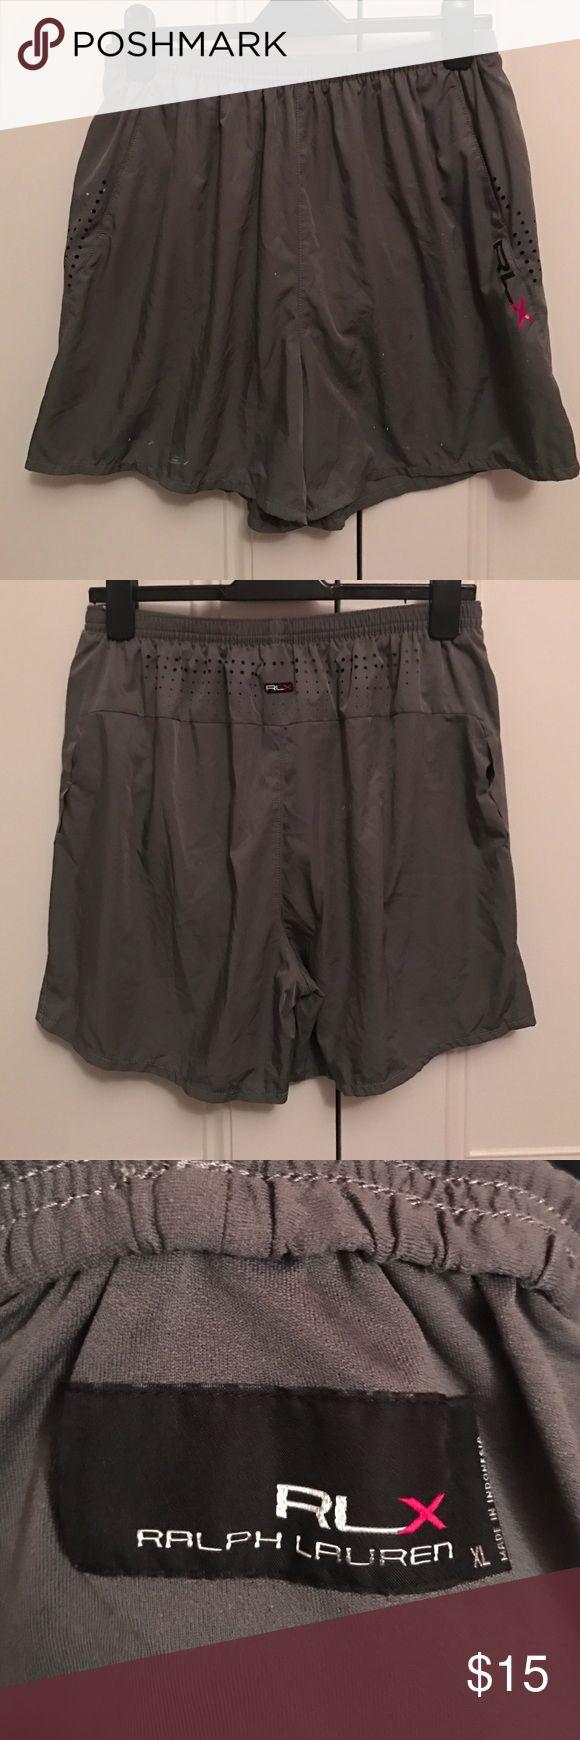 Ralph Lauren RLX gray shorts Ralph Lauren RLX gray shorts. White paint splatter on it Ralph Lauren Shorts Athletic